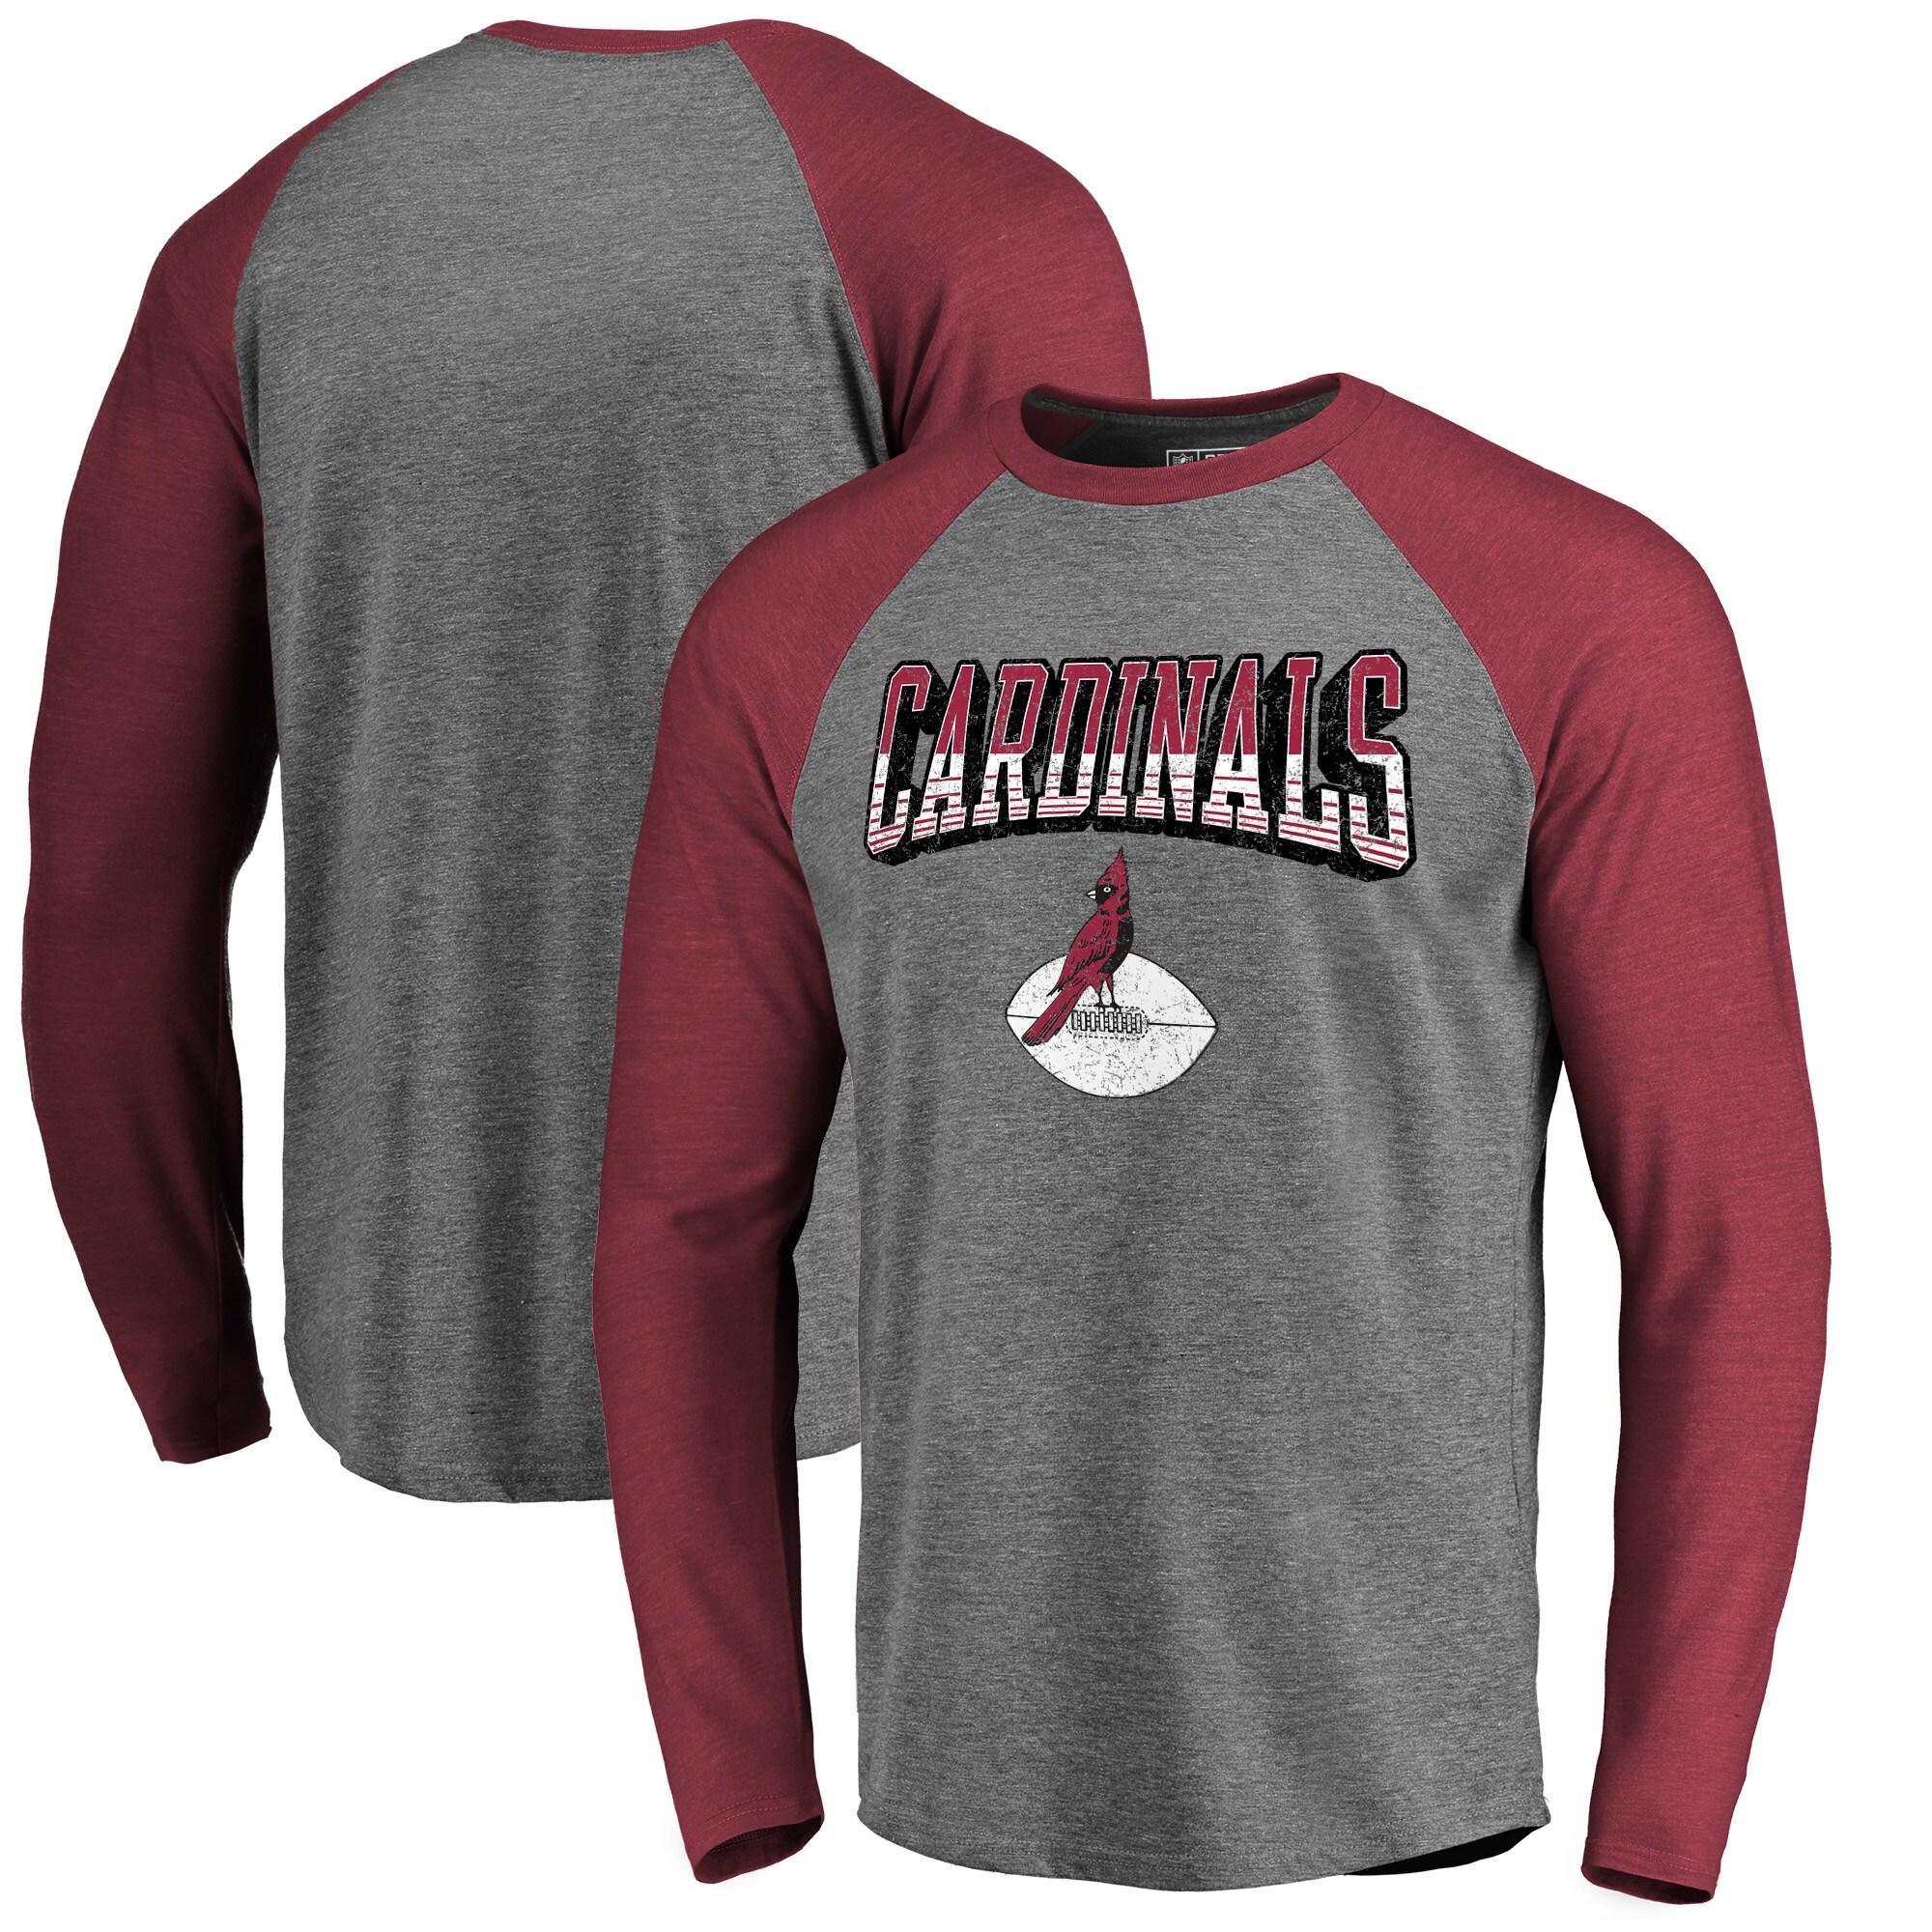 Arizona Cardinals NFL Pro Line by Fanatics Branded Throwback Collection Season Ticket Long Sleeve Tri-Blend Raglan T-Shirt - Heathered Gray/Cardinal